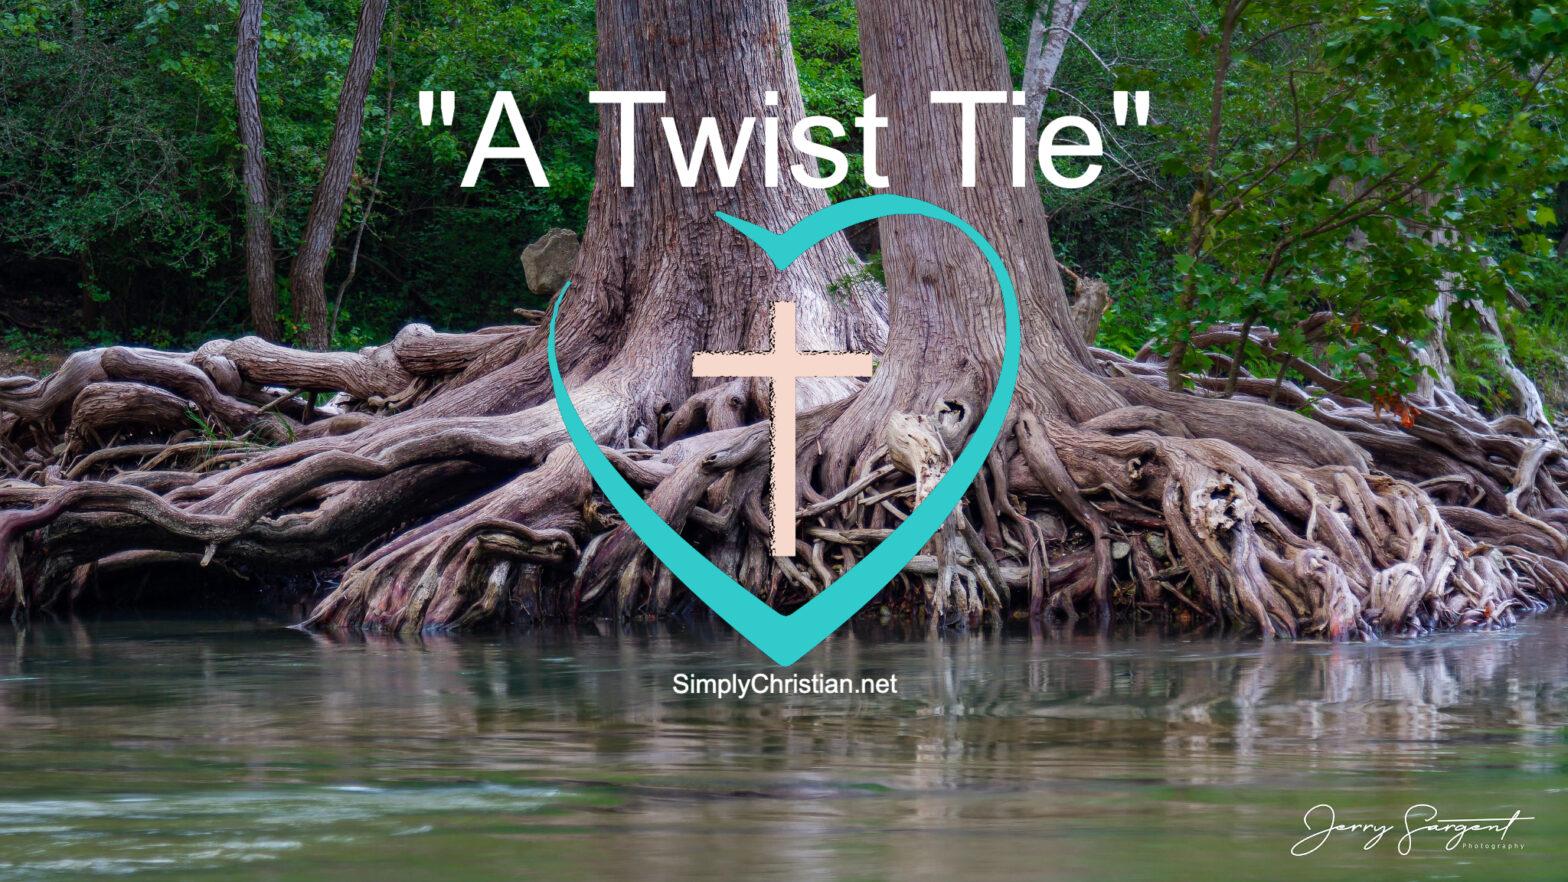 Simply Christian A Twist Tie David Tud Nance Jerry Sargent Open to Jesus